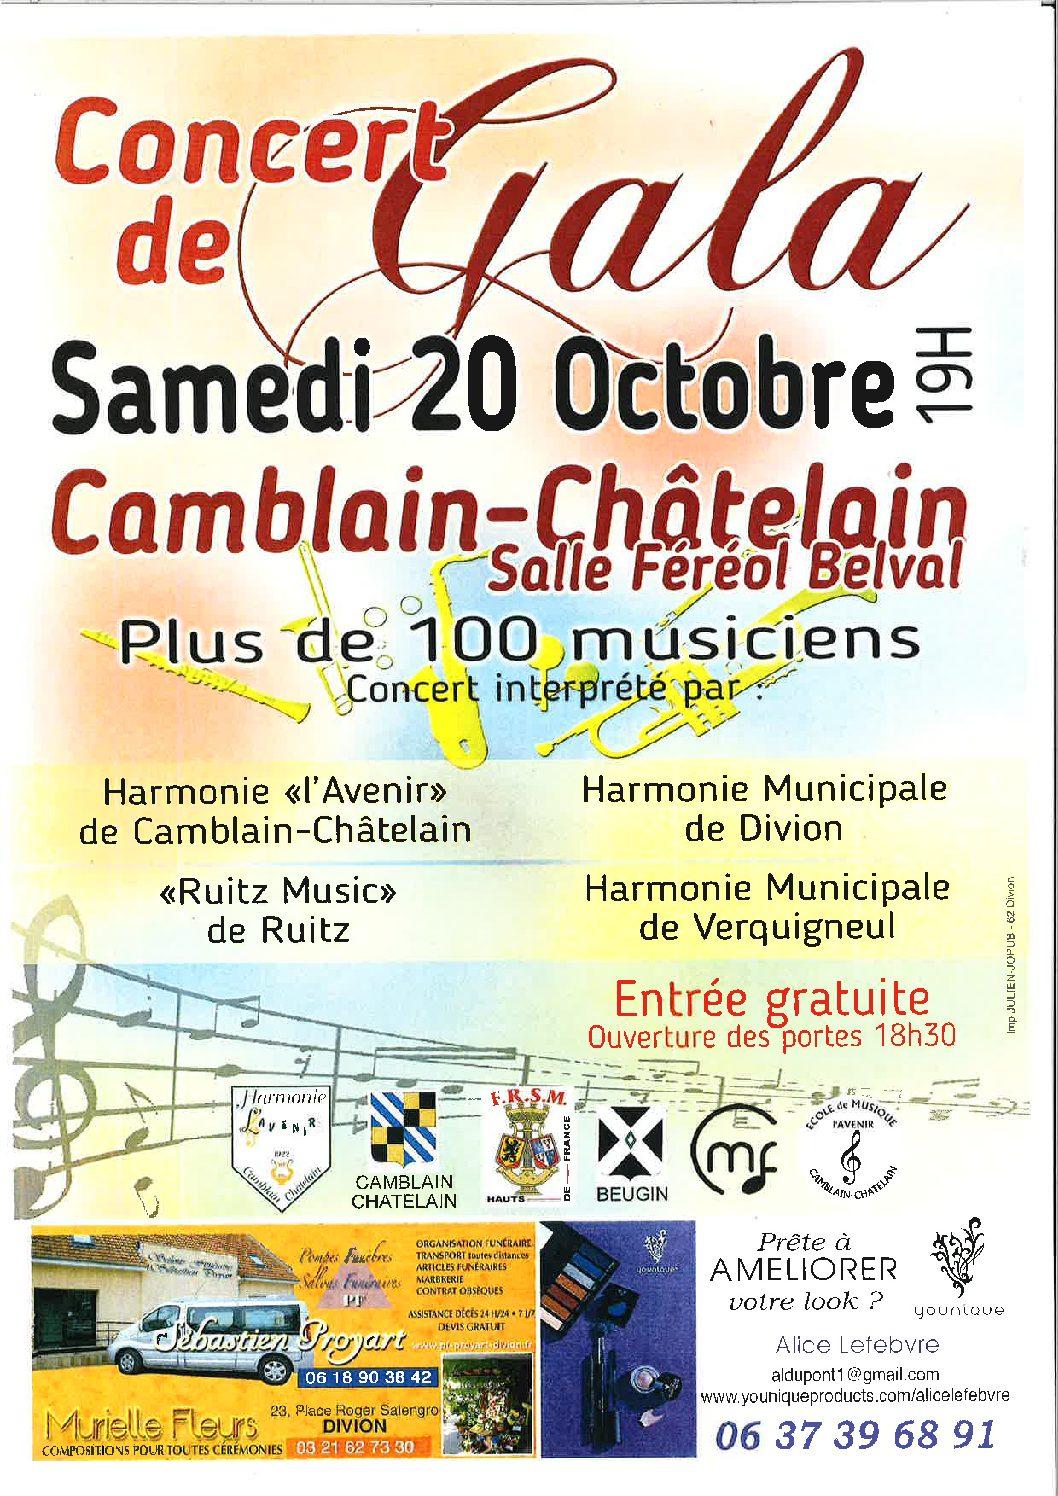 Concert de Gala – Samedi 20 Octobre 2018- 19 H  Salle Féréol Belval